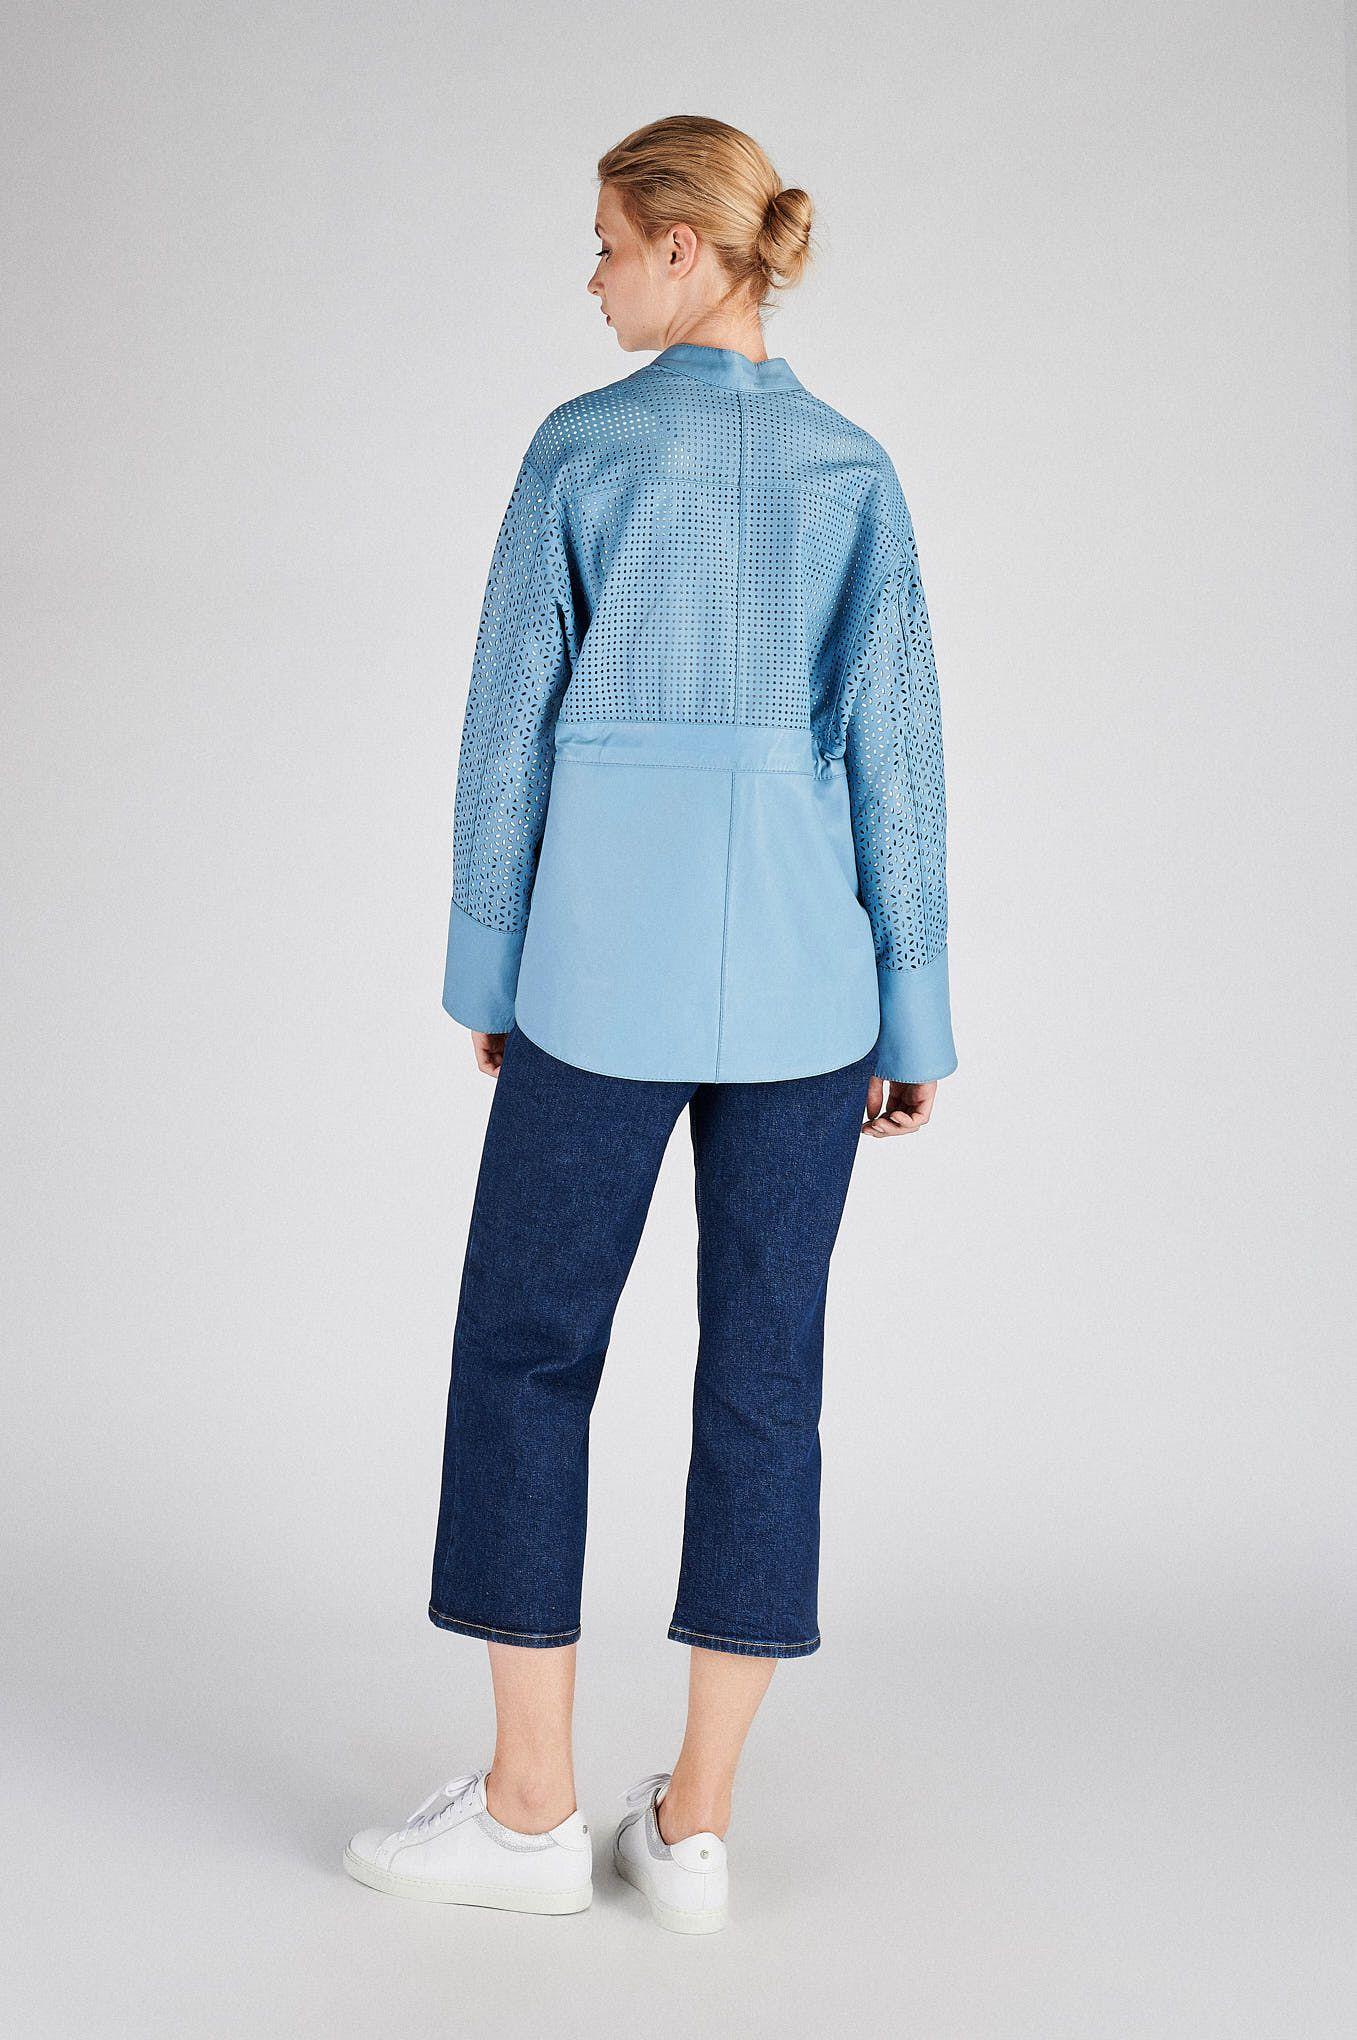 Women s Genuine Leather Casual Sport Jacket